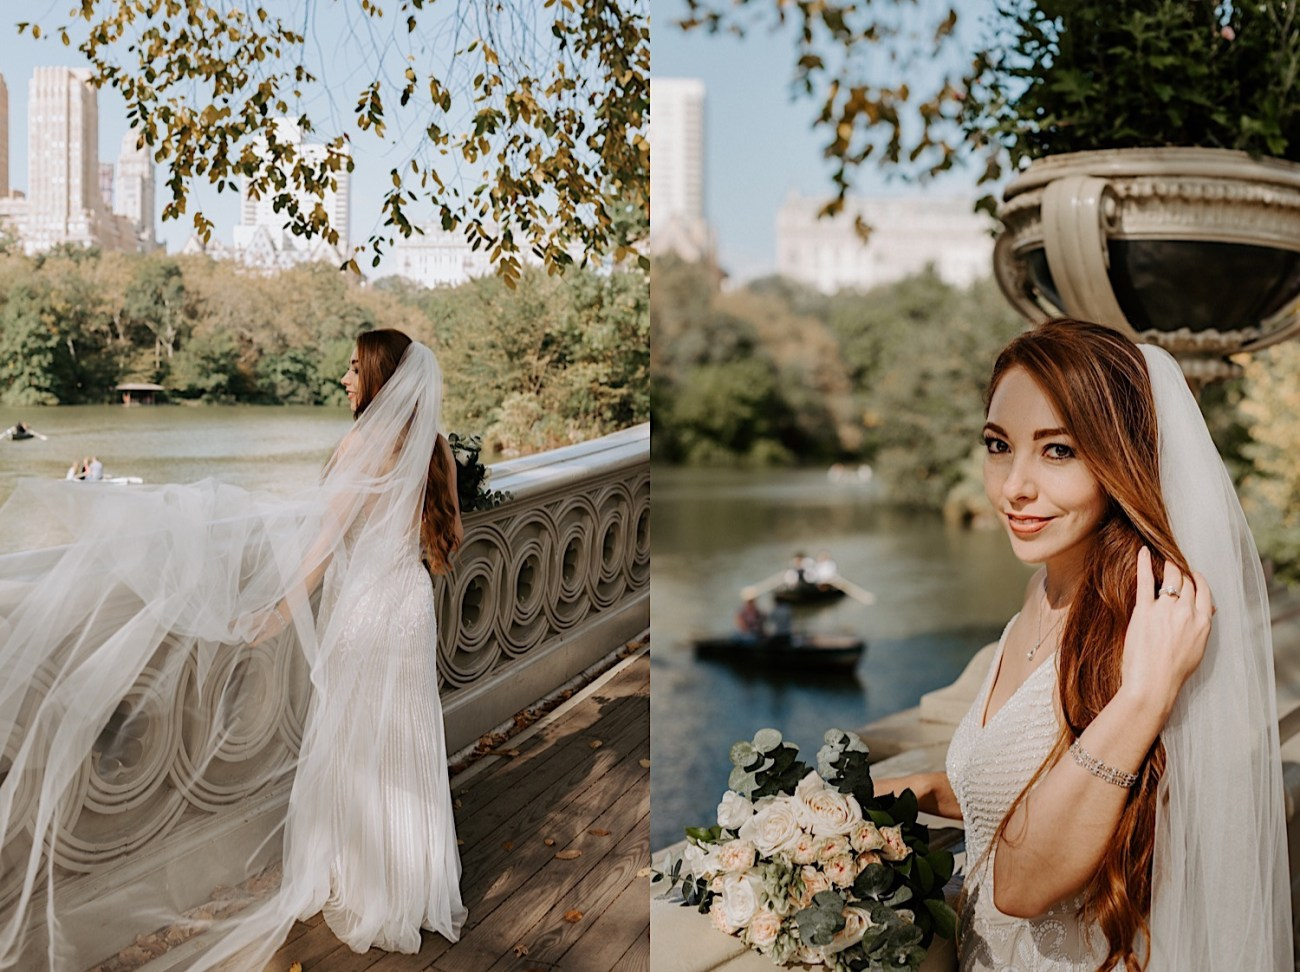 Central Park Wedding Photos Central Park Elopement NYC Wedding Photographer 25